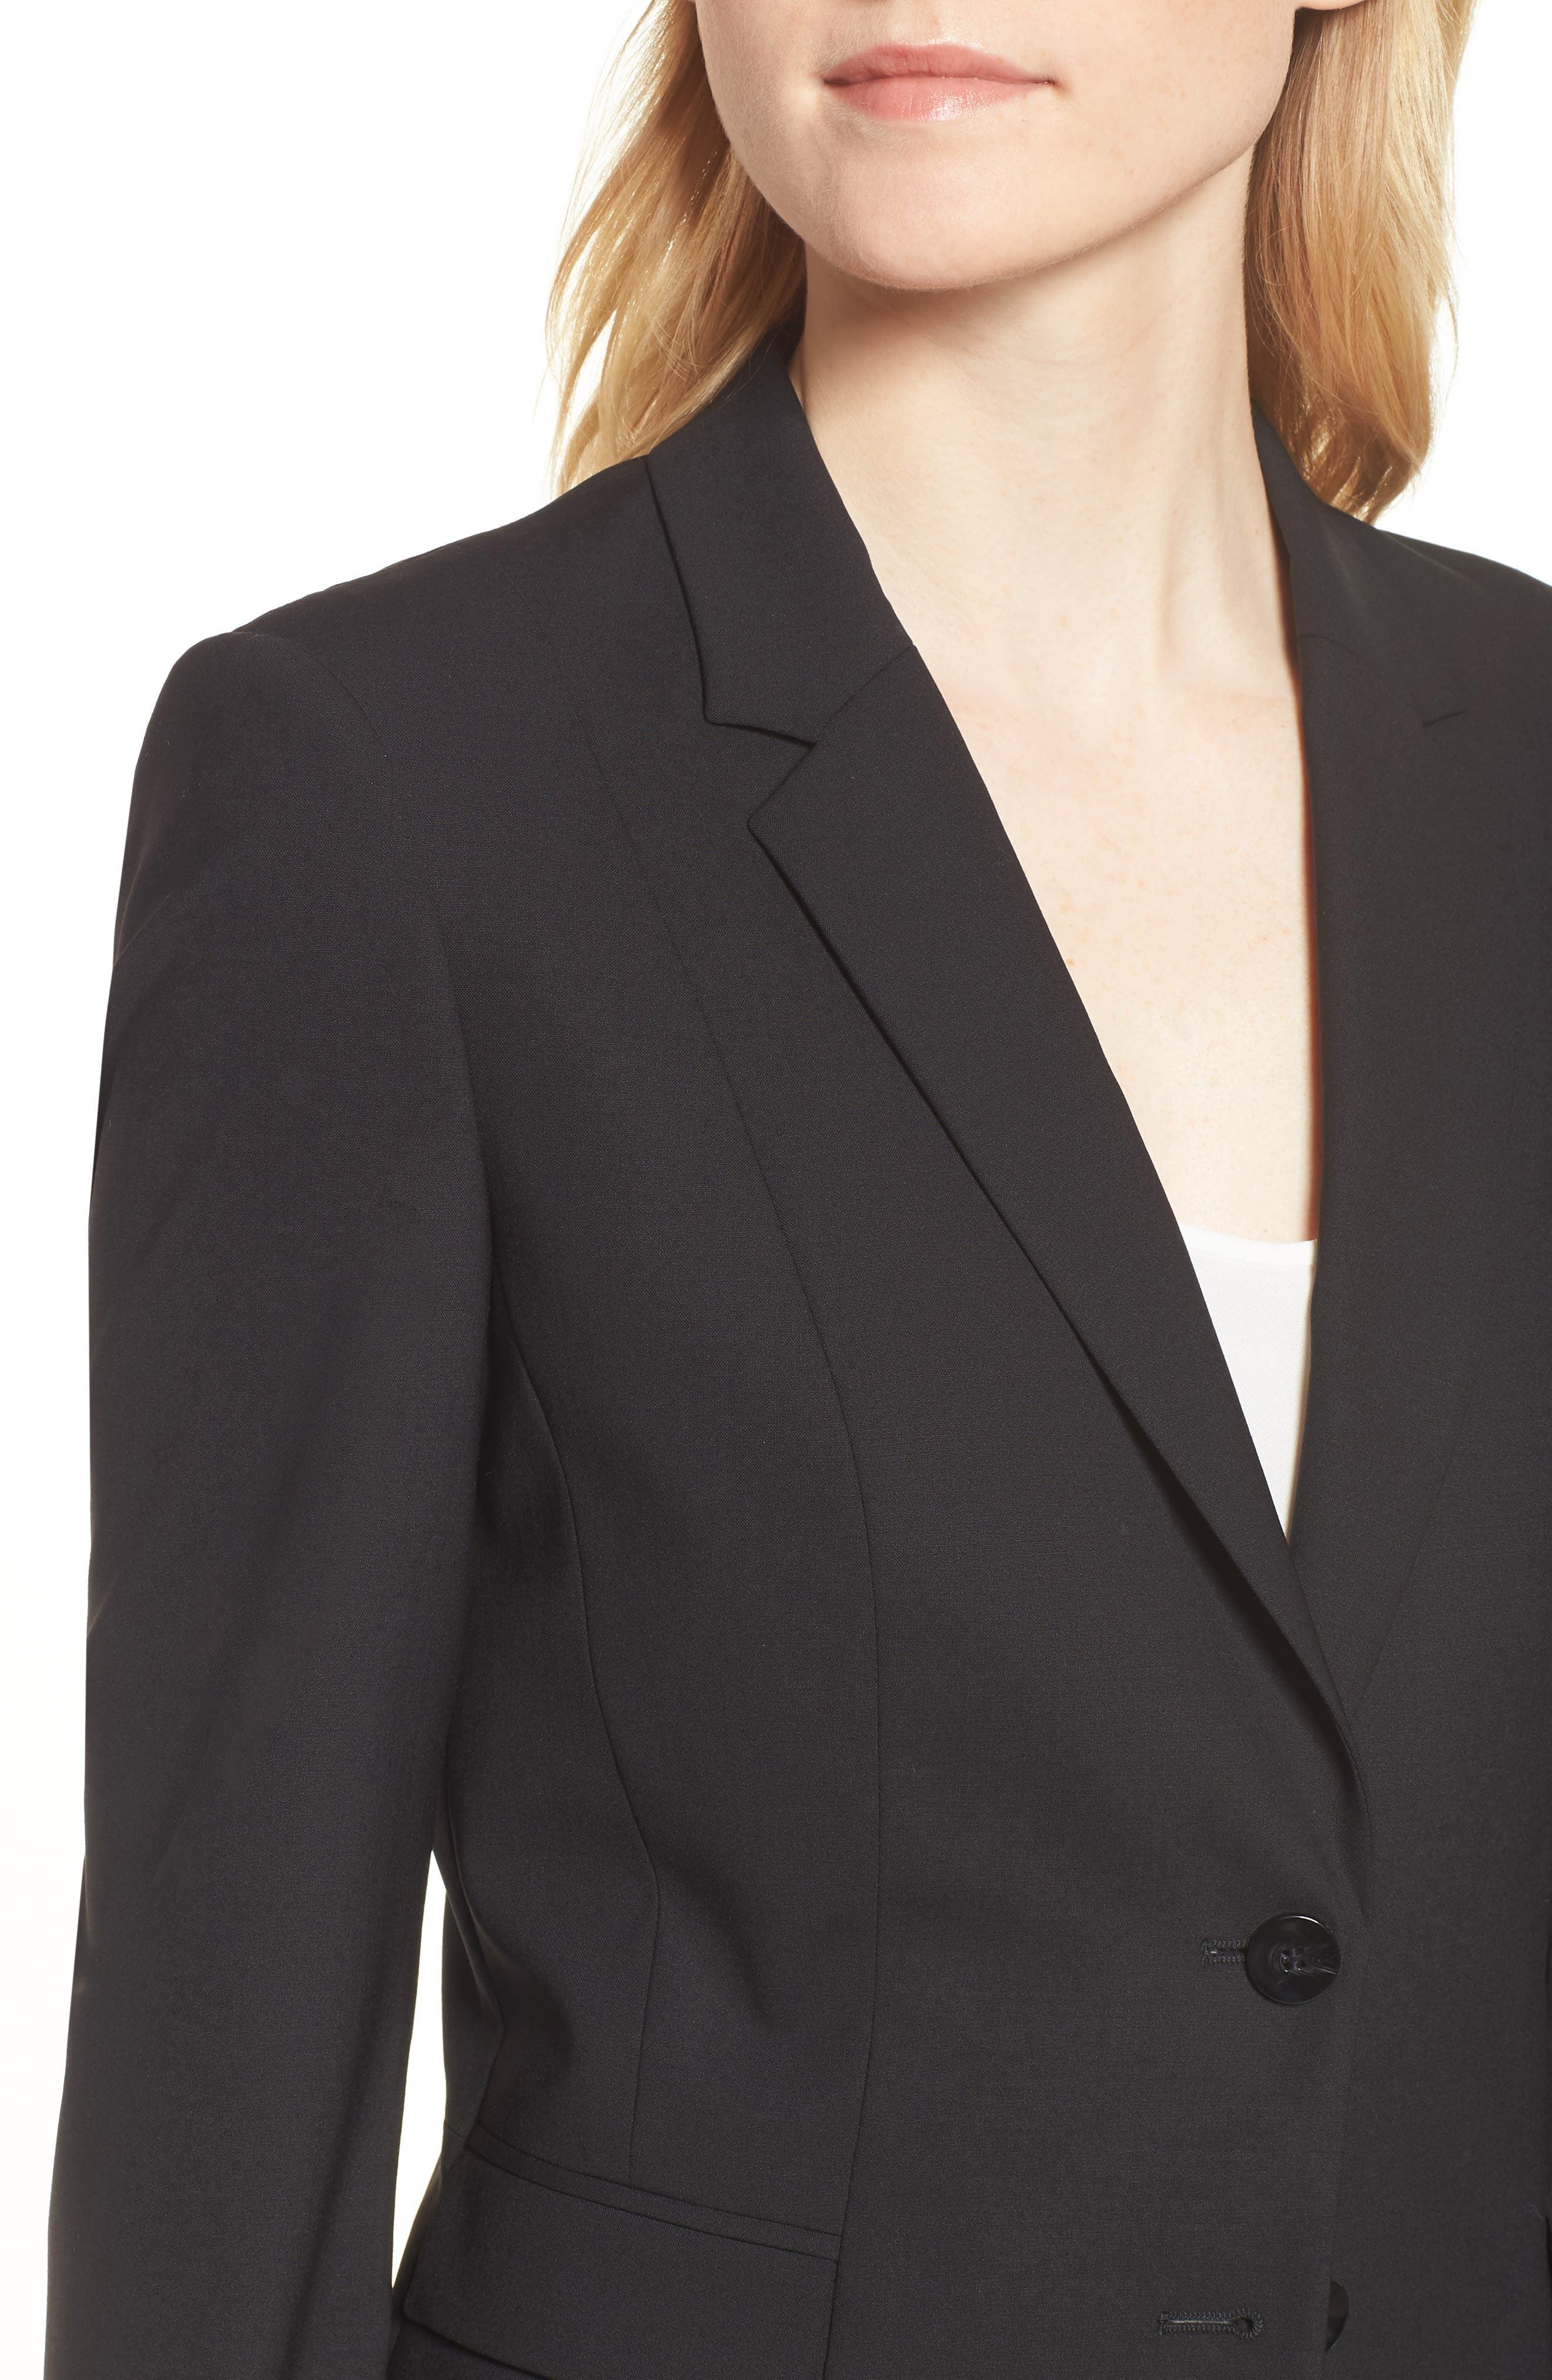 Jaru Stretch Wool Suit Jacket,                             Alternate thumbnail 4, color,                             Black